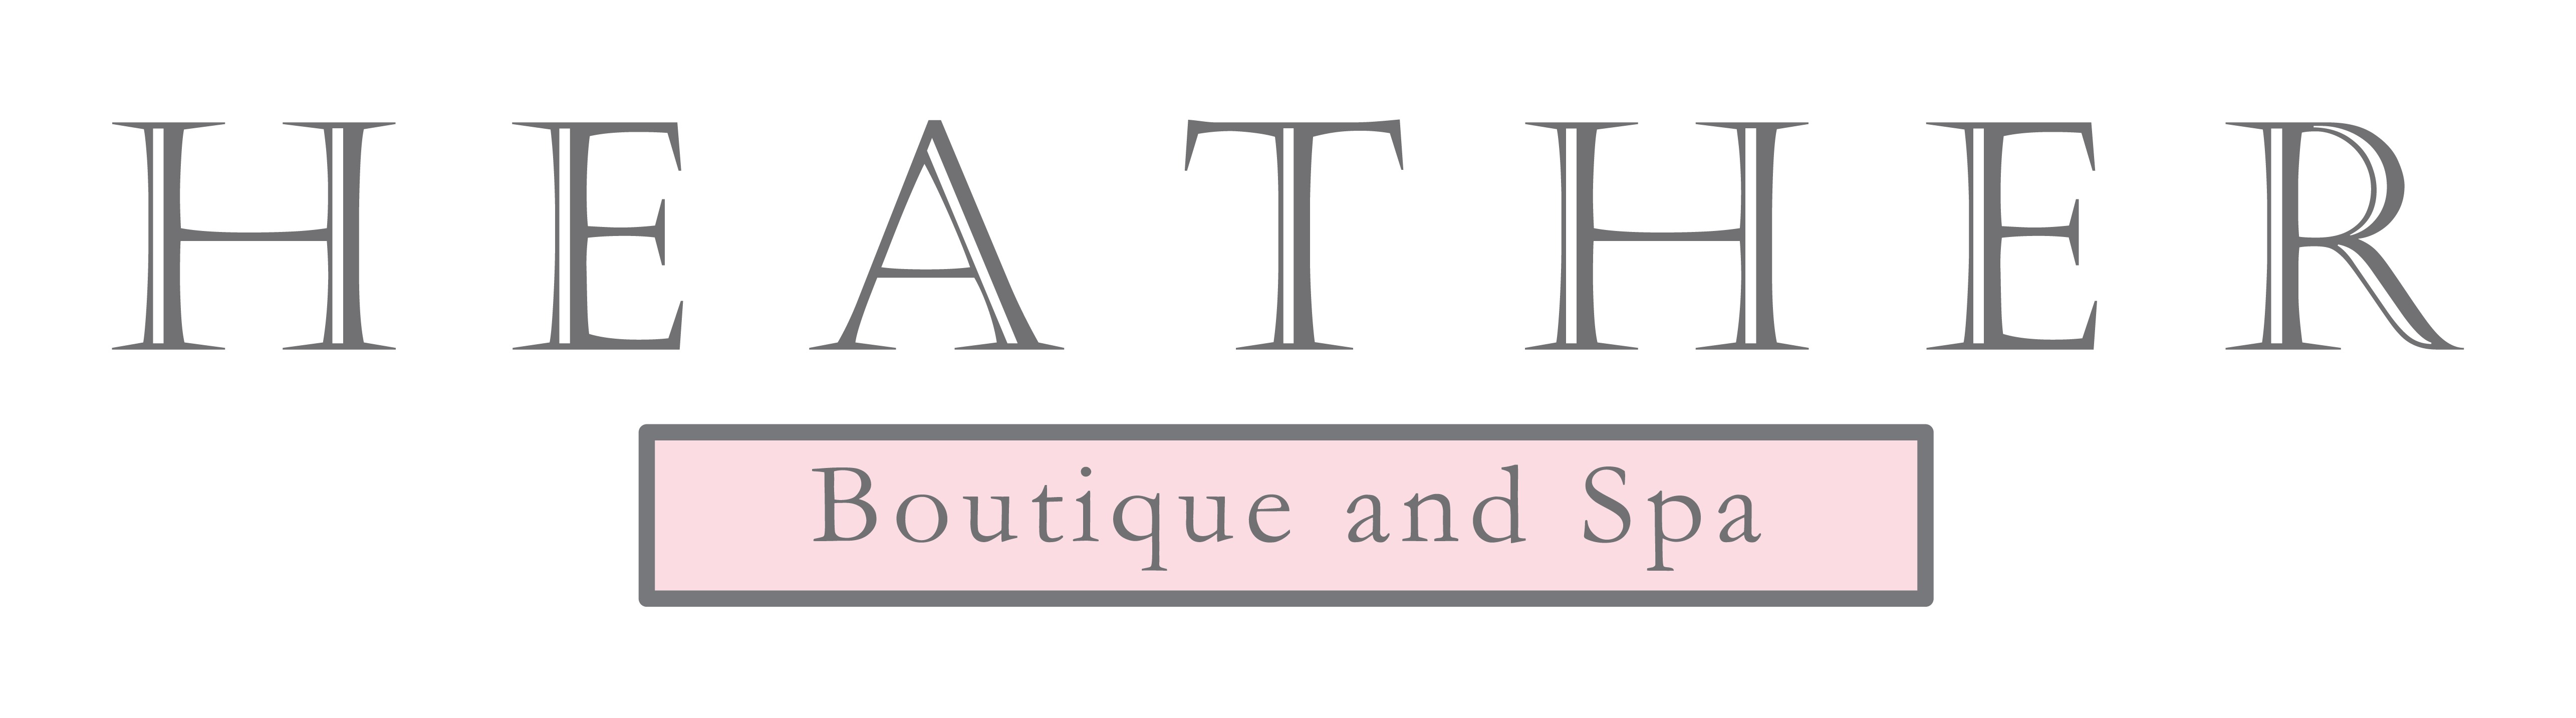 Heather Boutique & Spa